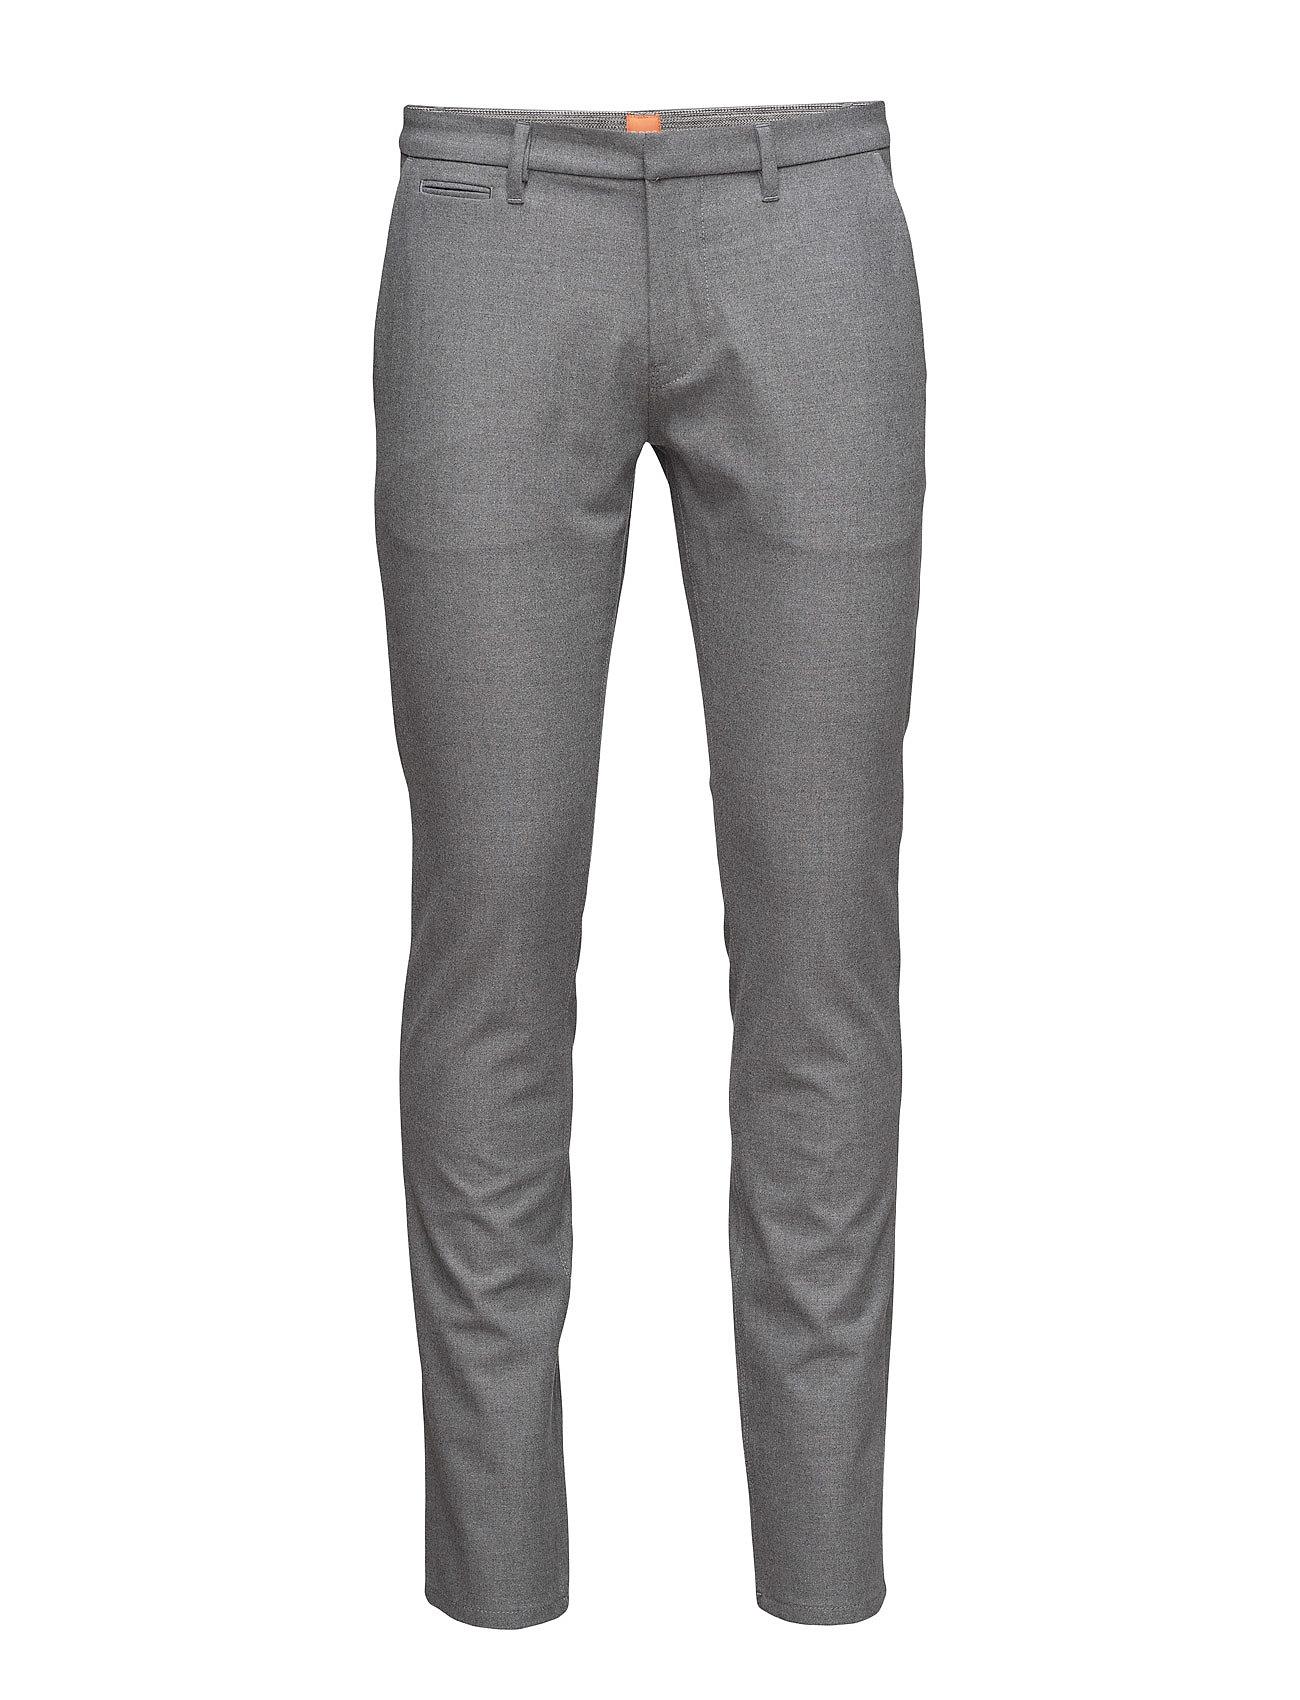 Schino-Slim3-W BOSS Orange Bukser til Mænd i Mellem grå